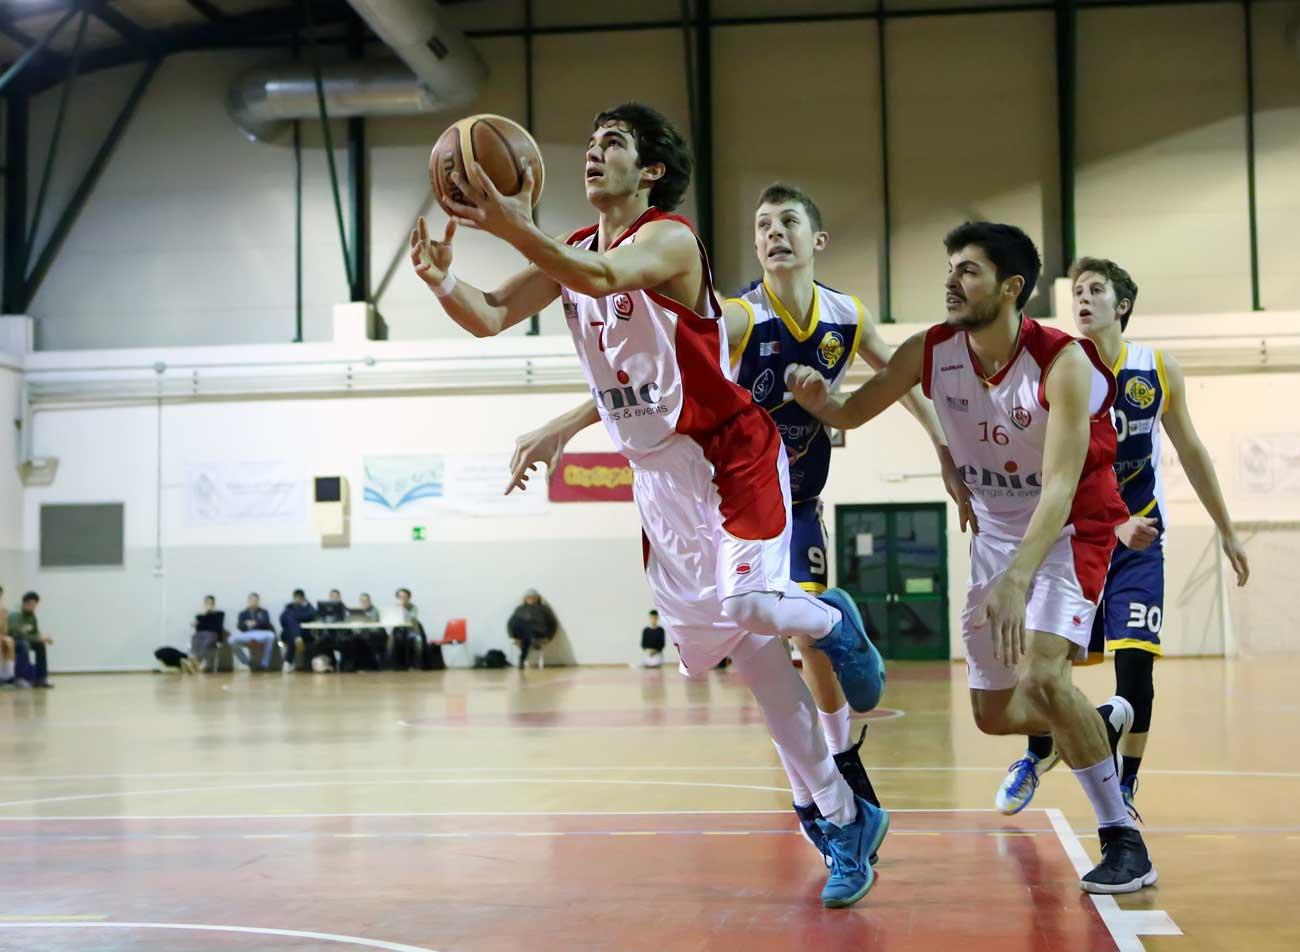 09vieri_marotta_enic_pinodragons_castelfiorentino_basket2016